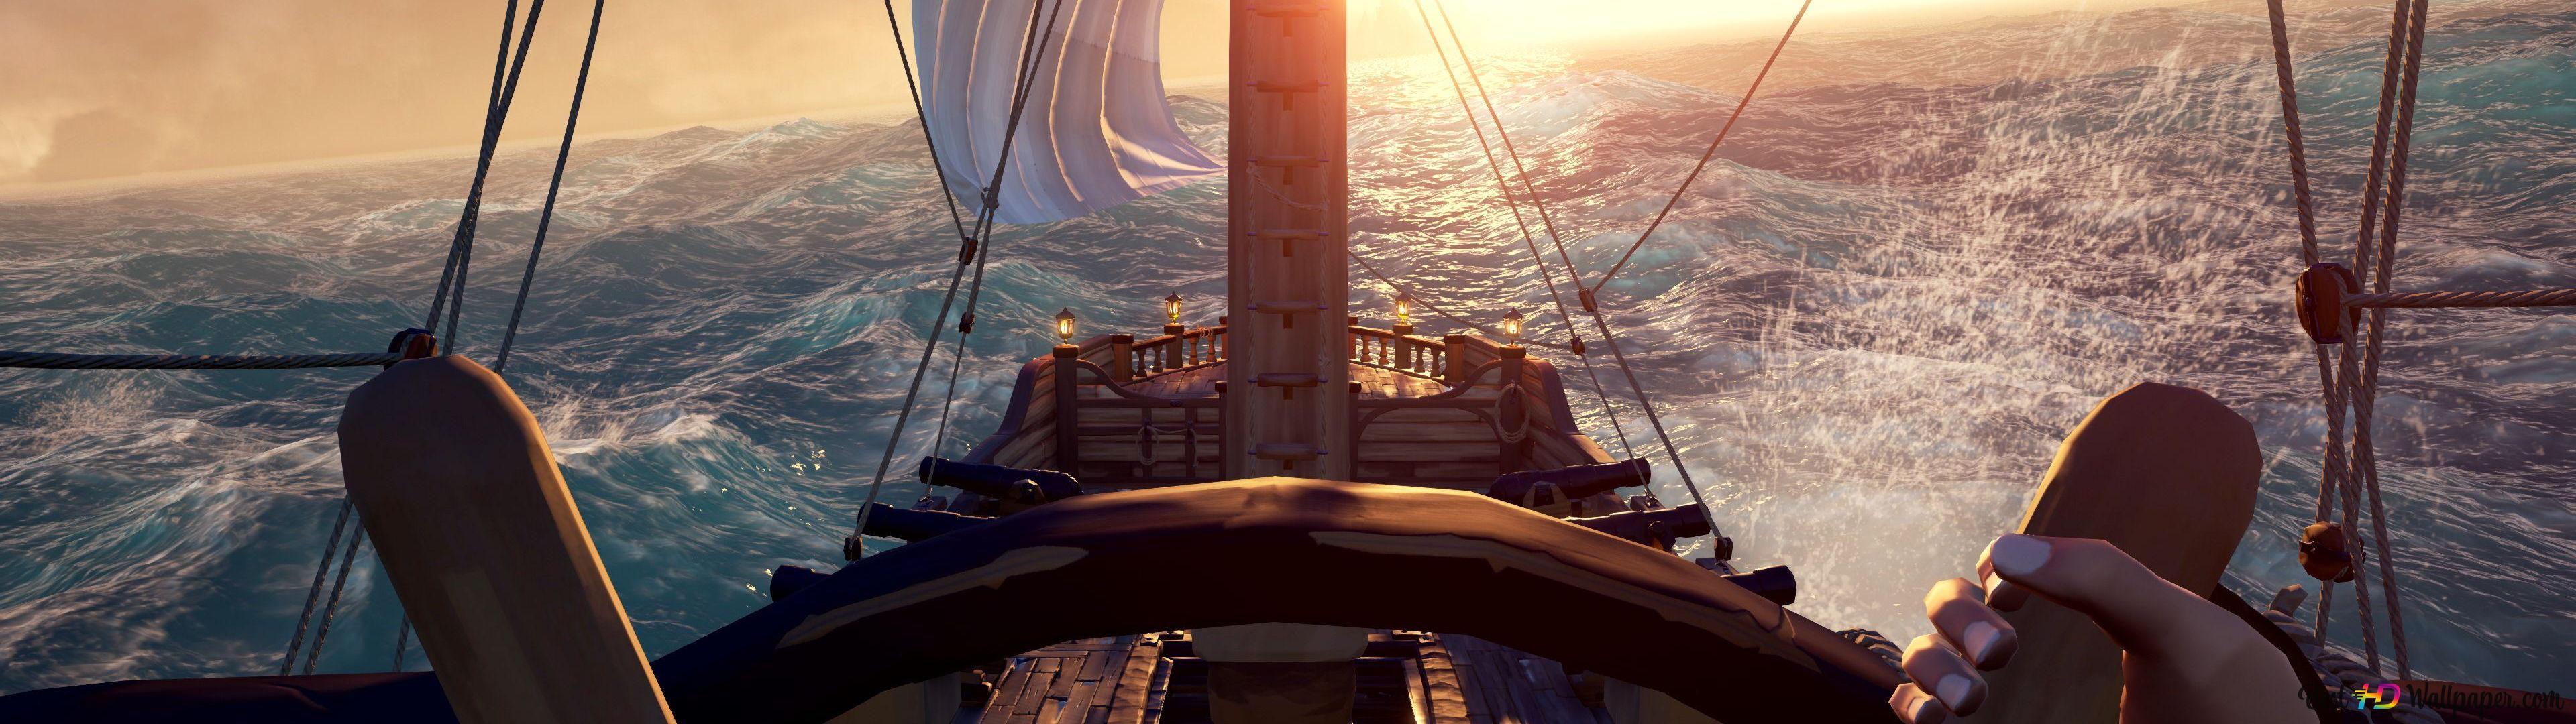 Sailing Sea Of Thieves Hd Wallpaper Download